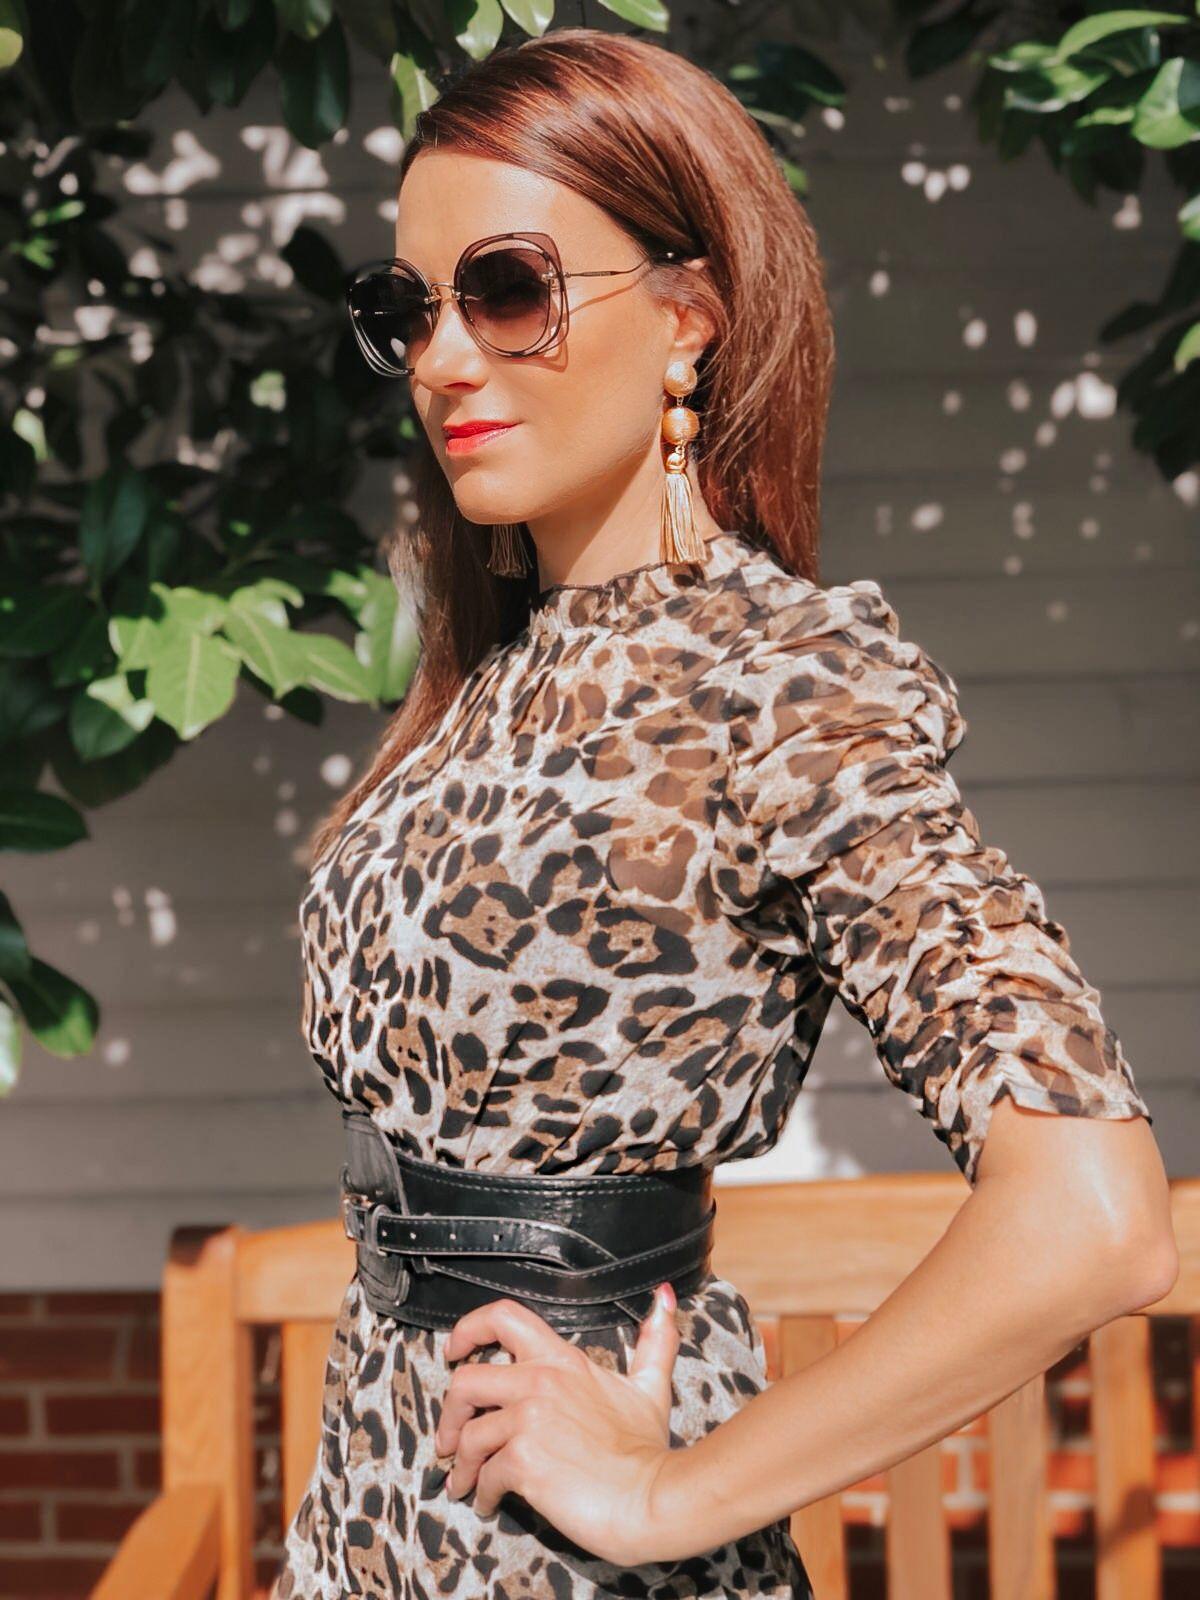 Elegant Duchess Fashion V by Very Ruched Sleeve Frill Tea Dress - Leopard Print   Ted Baker sheer court shoes   Miu Miu sunglasses   Swarovski earrings Asos belt   Calvin Klein clutch bag